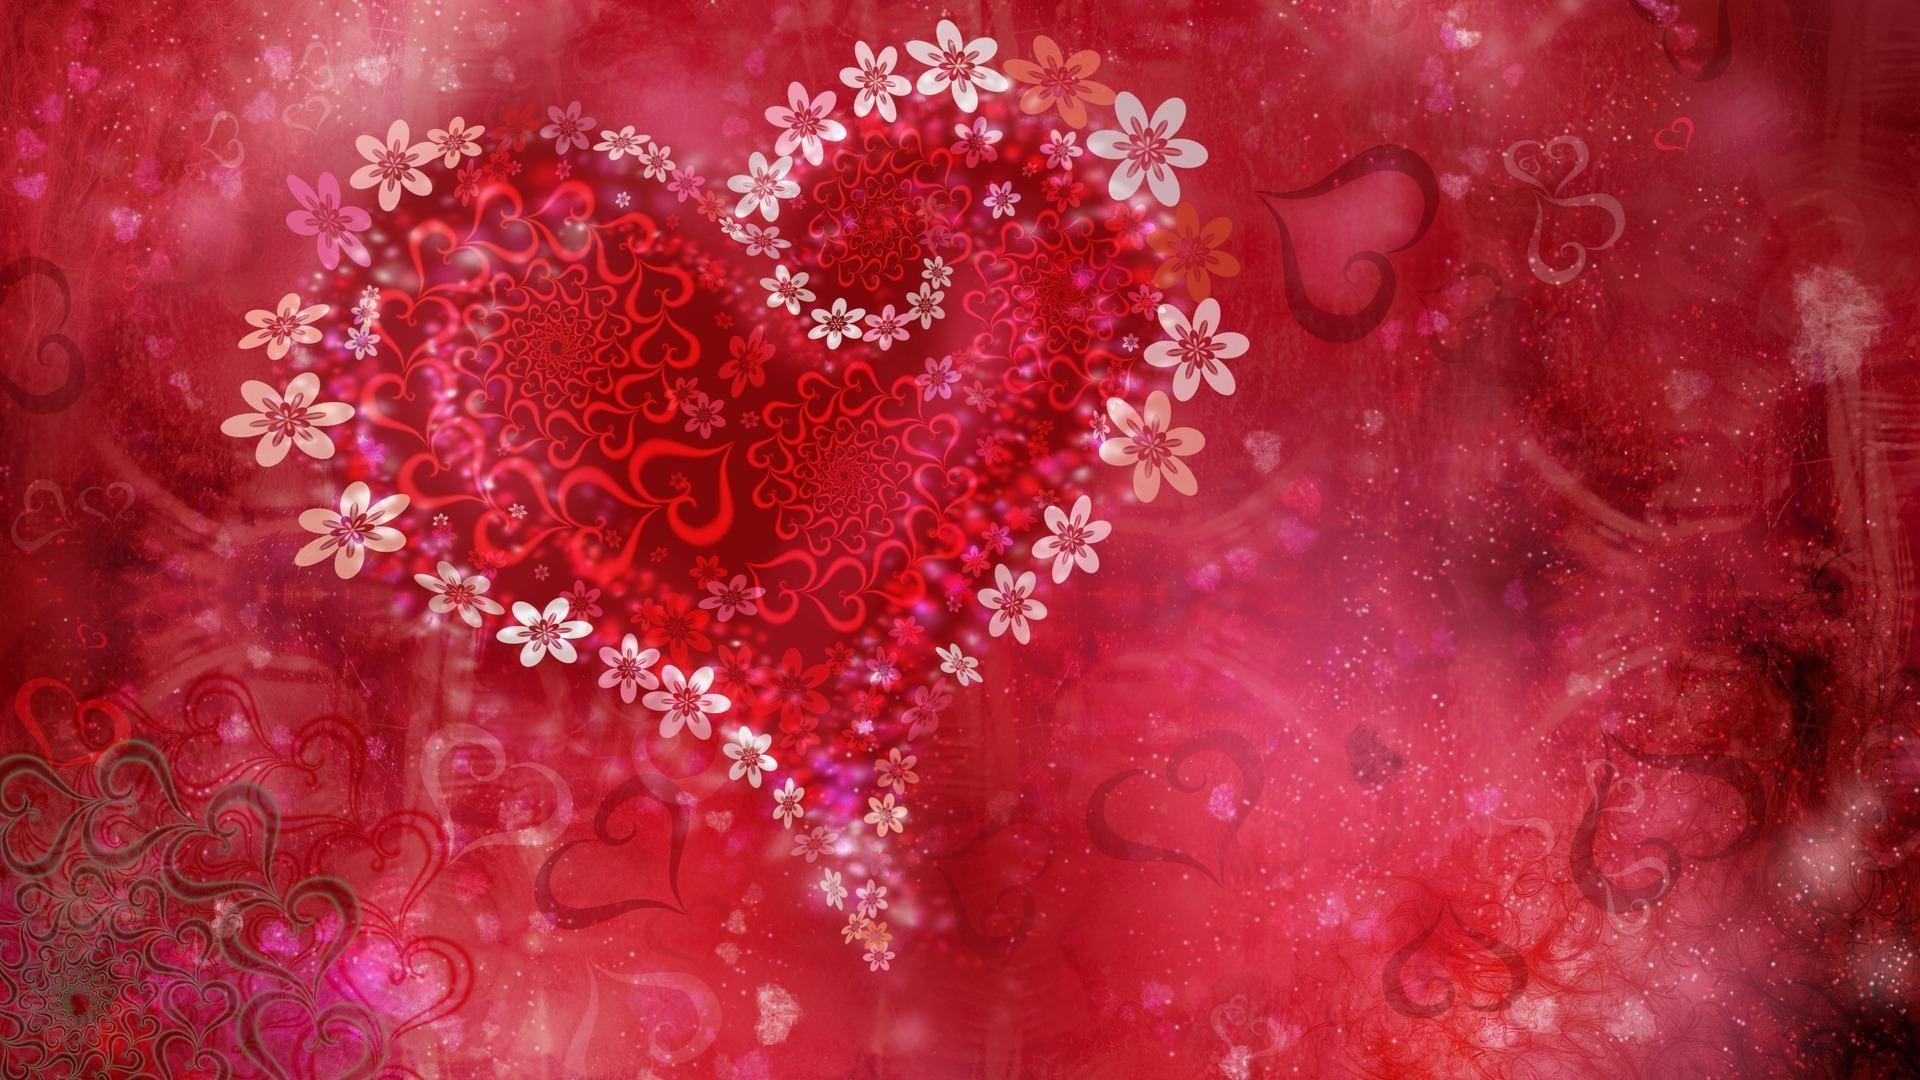 heart-girly-hd-wallpapers-desktop-background